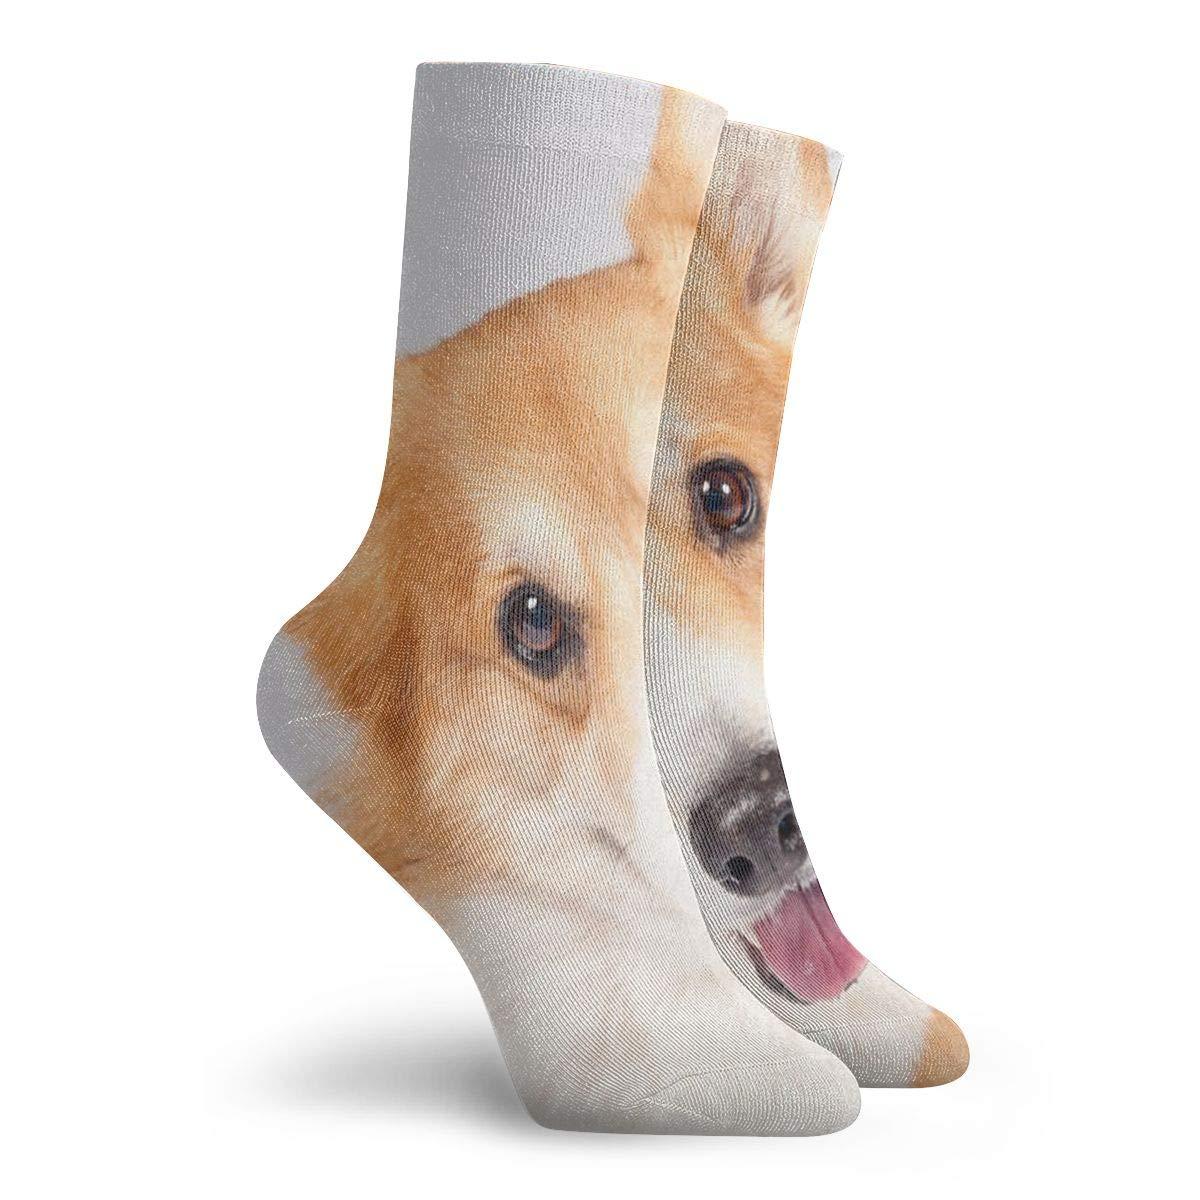 WEEDKEYCAT Cute Smile Welsh Corgi Dog Adult Short Socks Cotton Cute Socks for Mens Womens Yoga Hiking Cycling Running Soccer Sports